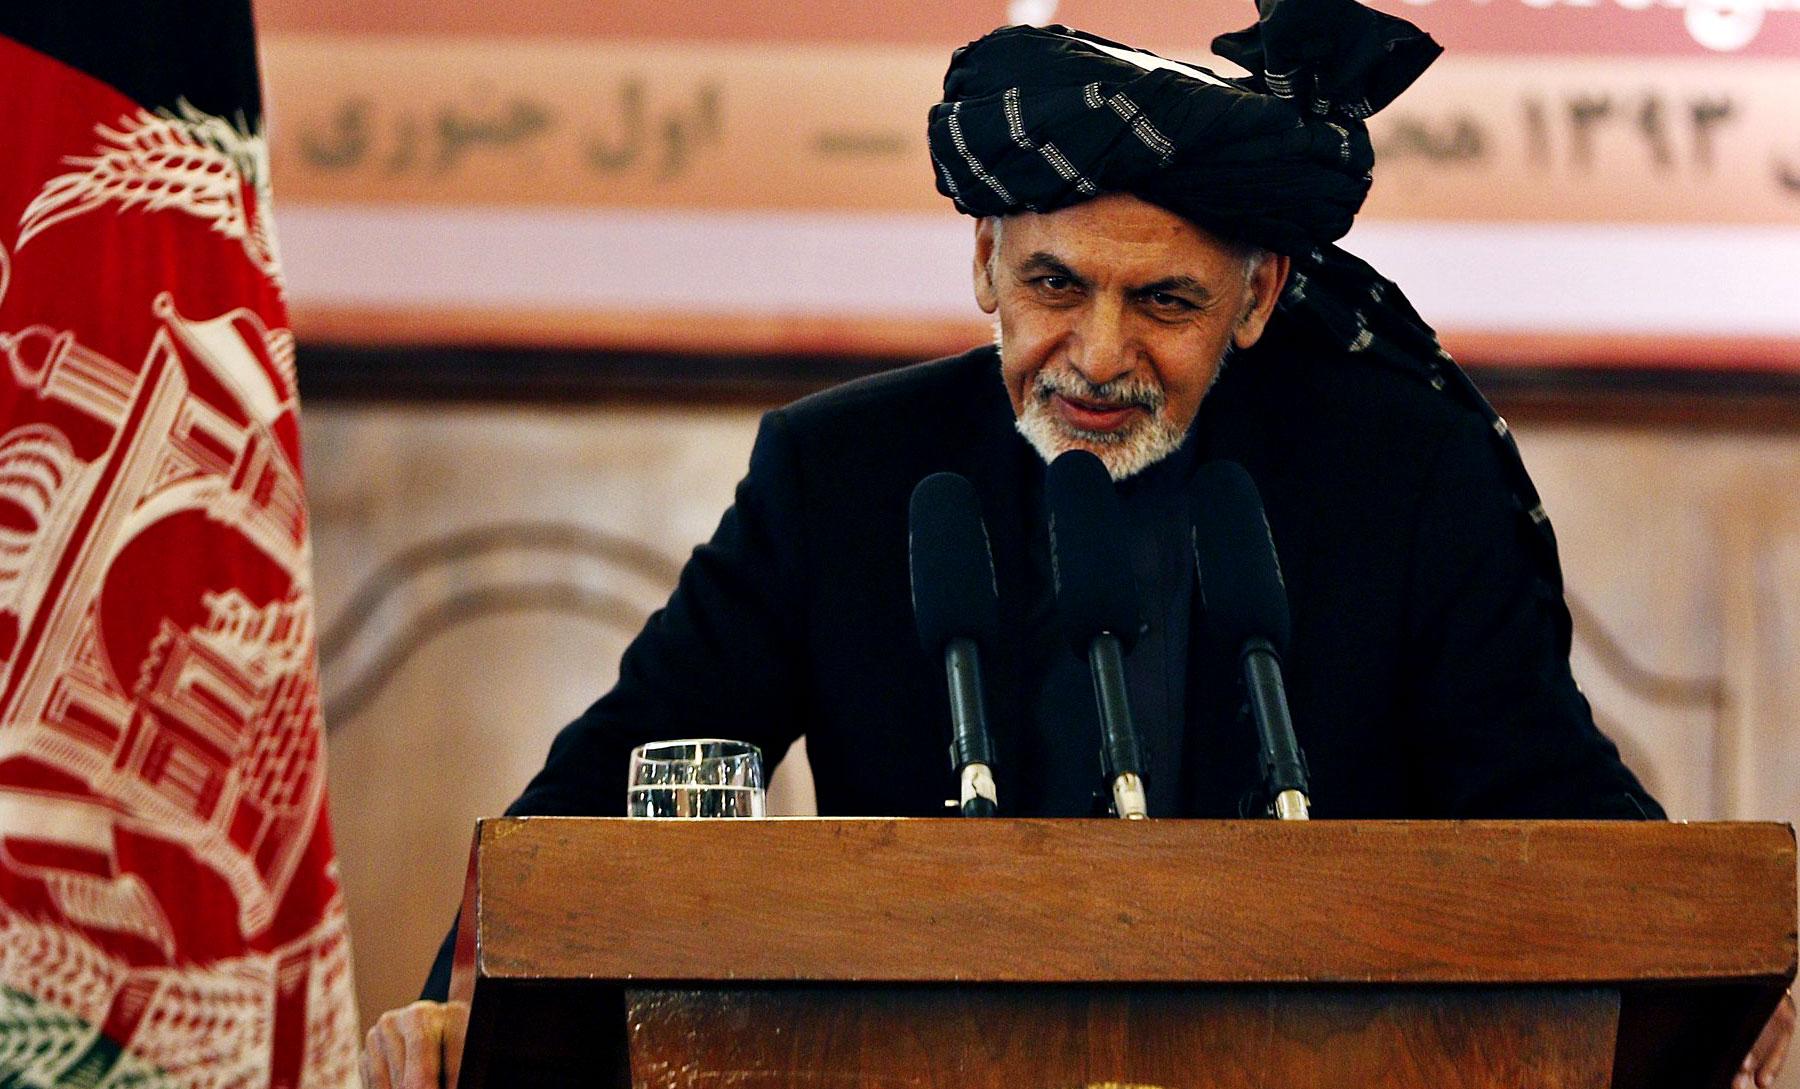 अफगानिस्तान के राष्ट्रपति अशरफ गनी